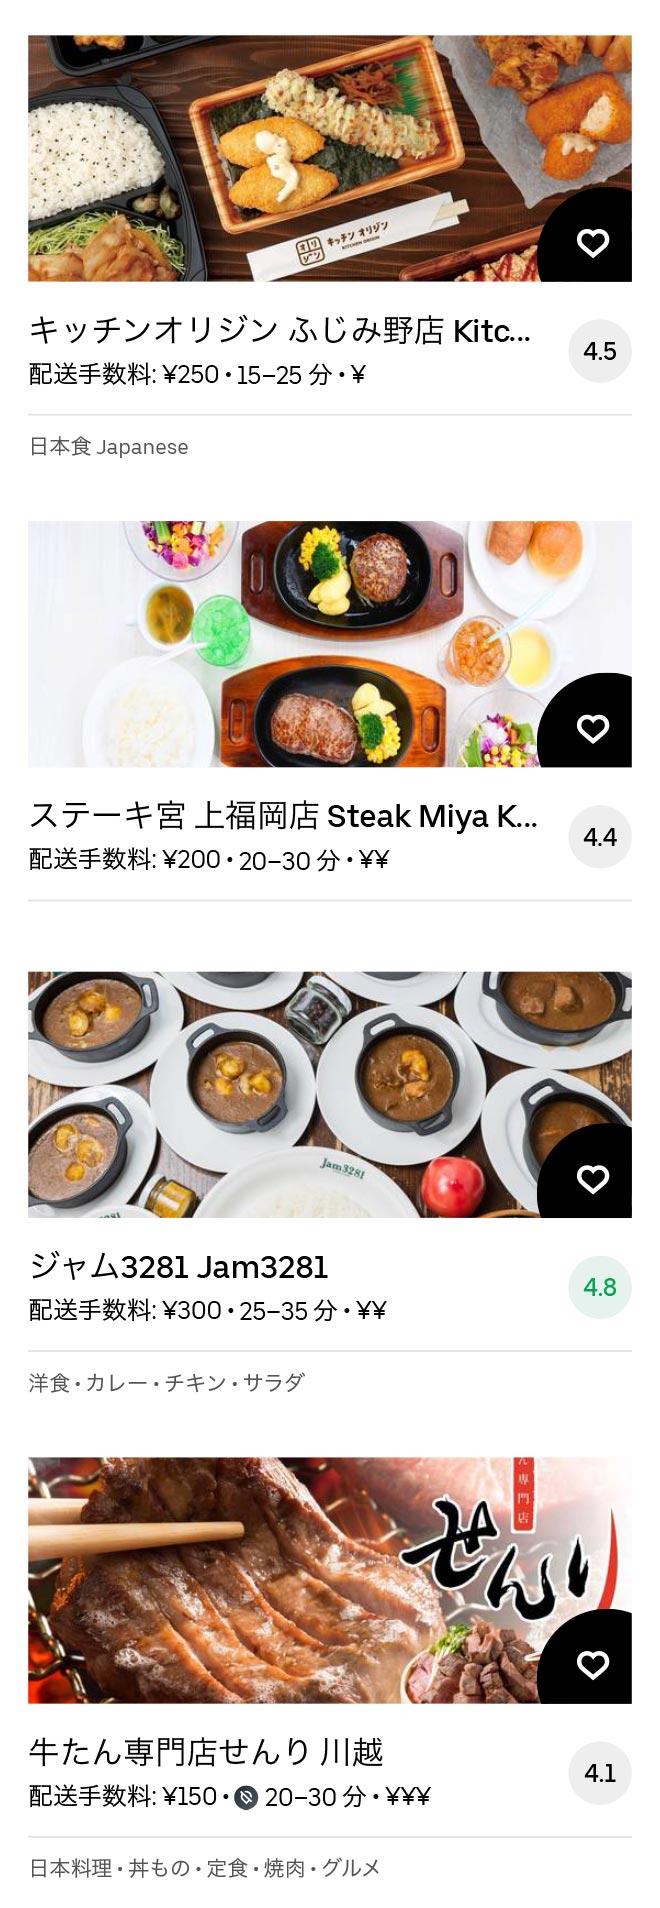 Kamifukuoka menu 2011 08